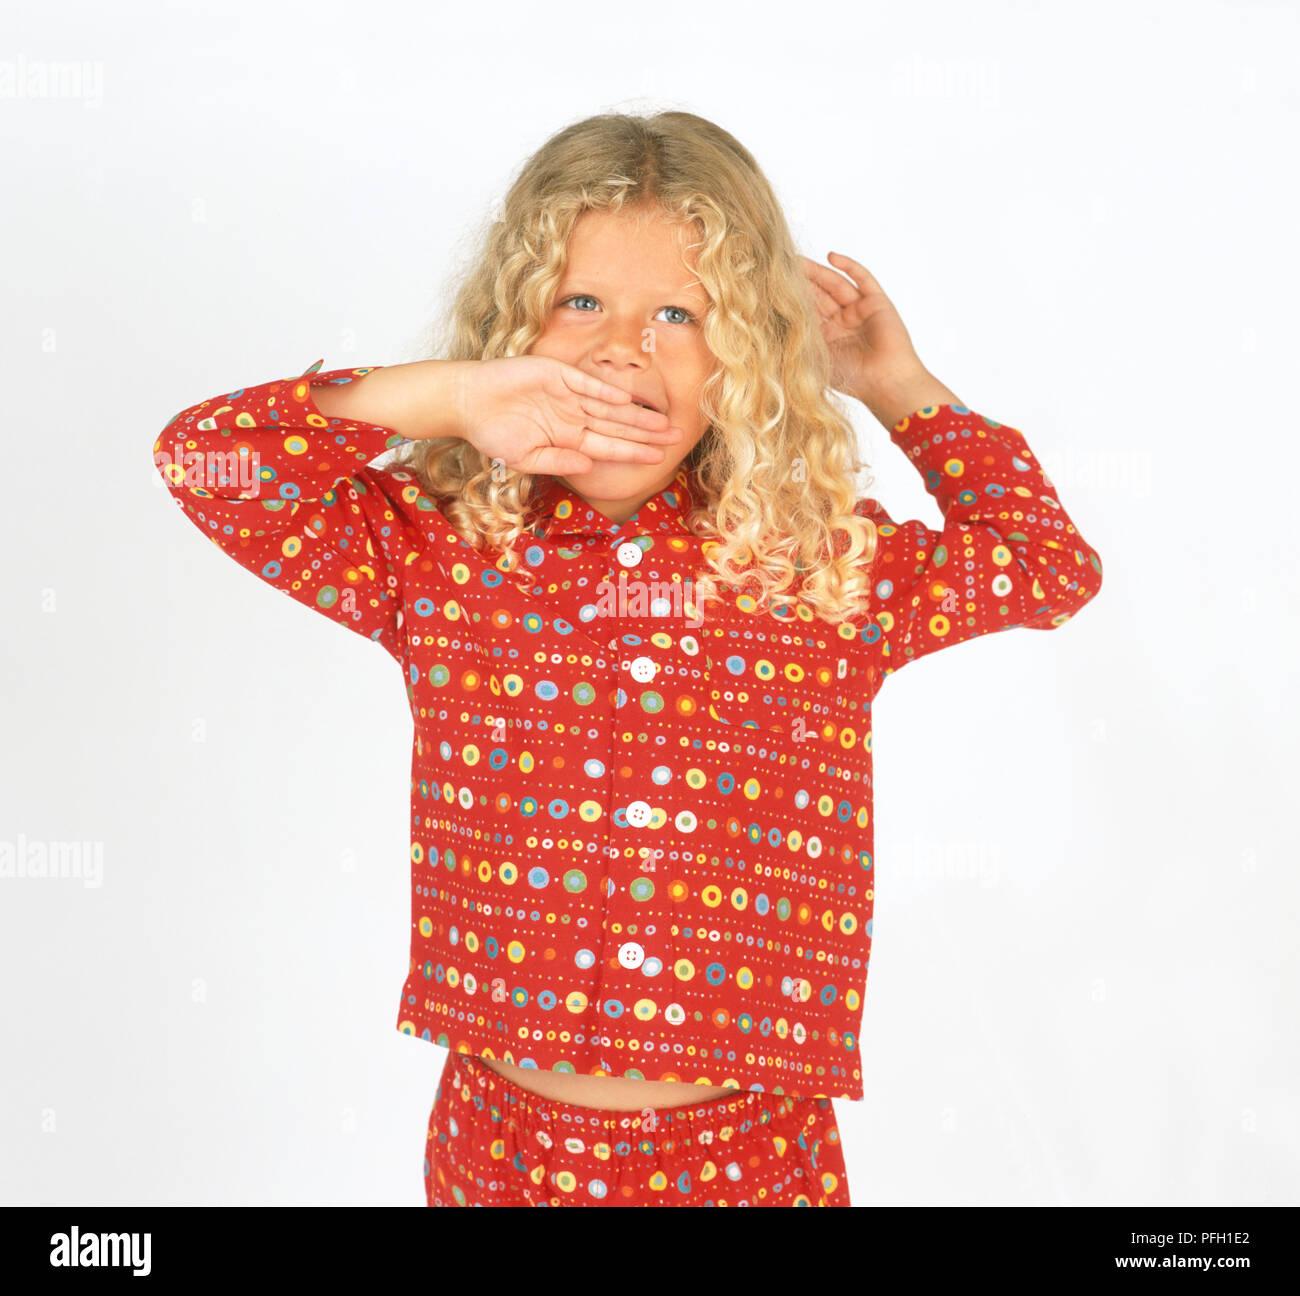 Girl in pyjamas yawning - Stock Image